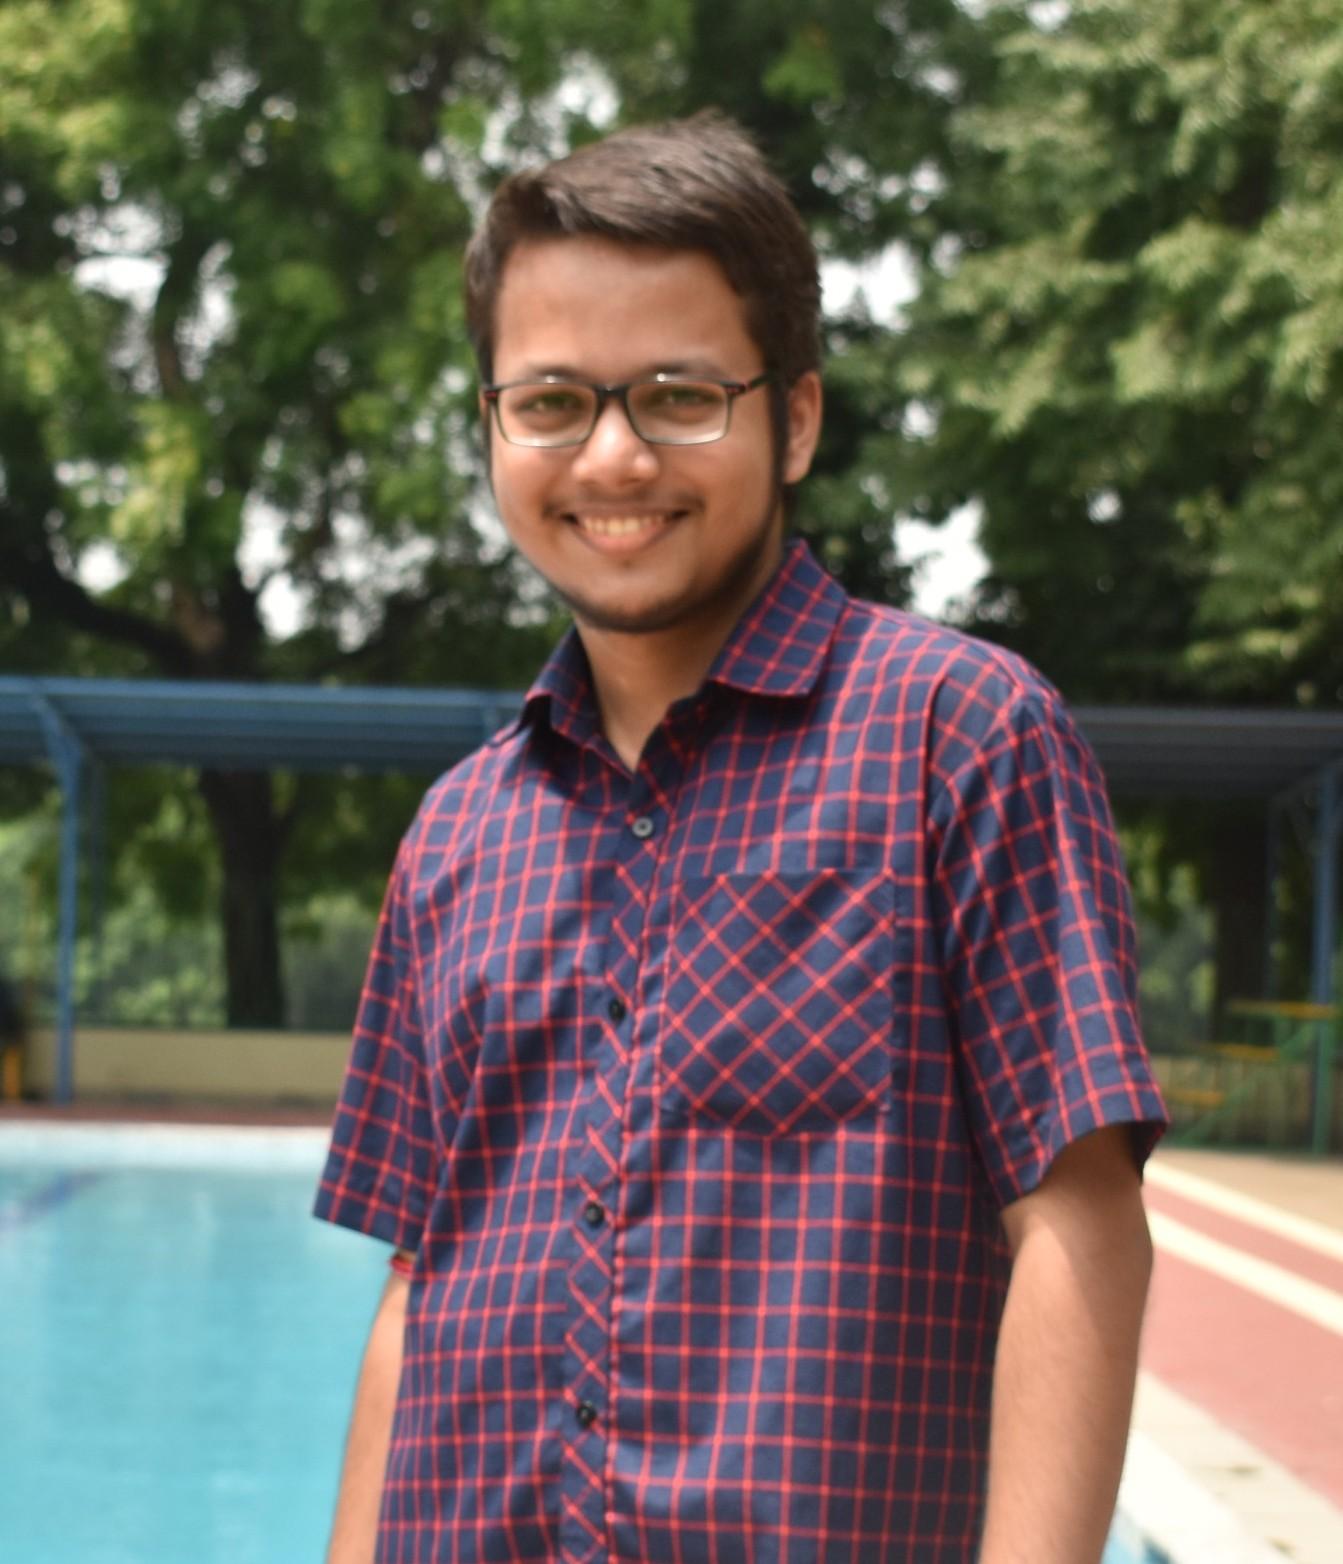 Souham Banerjee